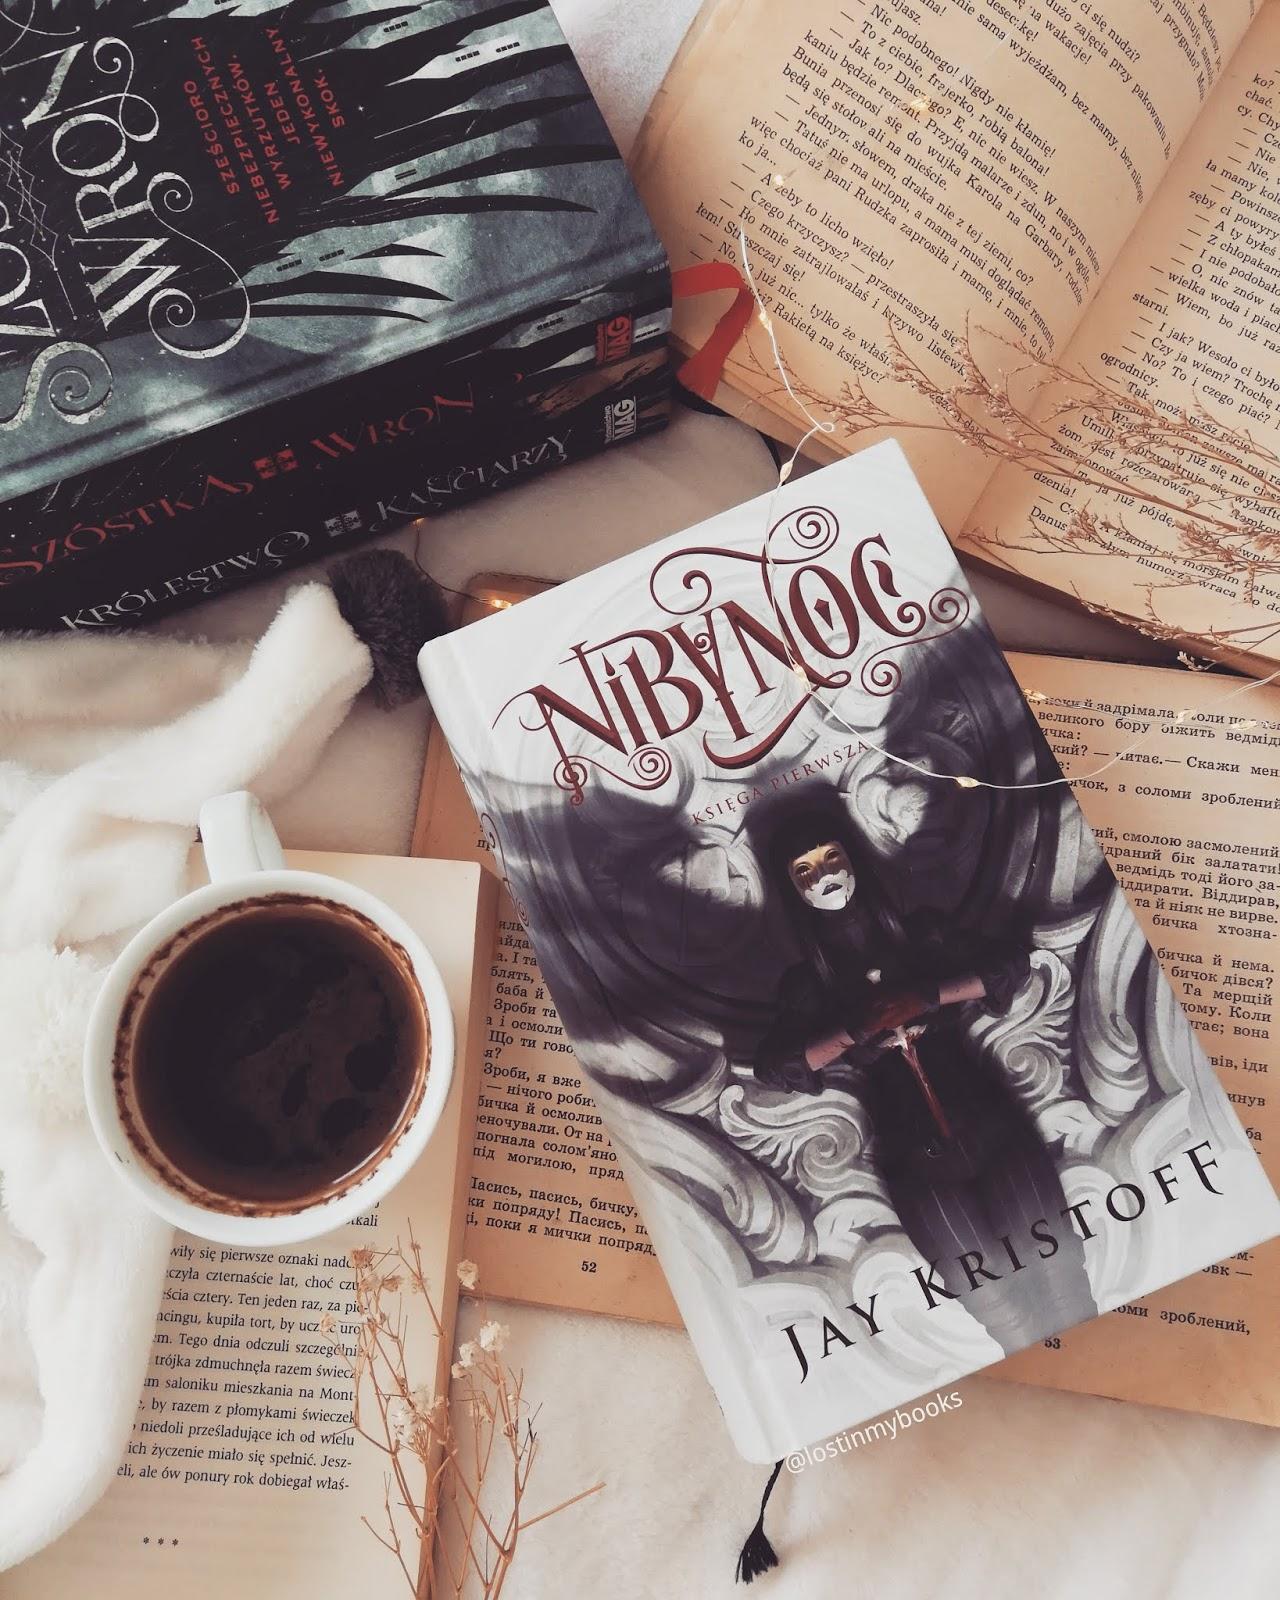 ",,NIBYNOC"" Jay Krestoff"